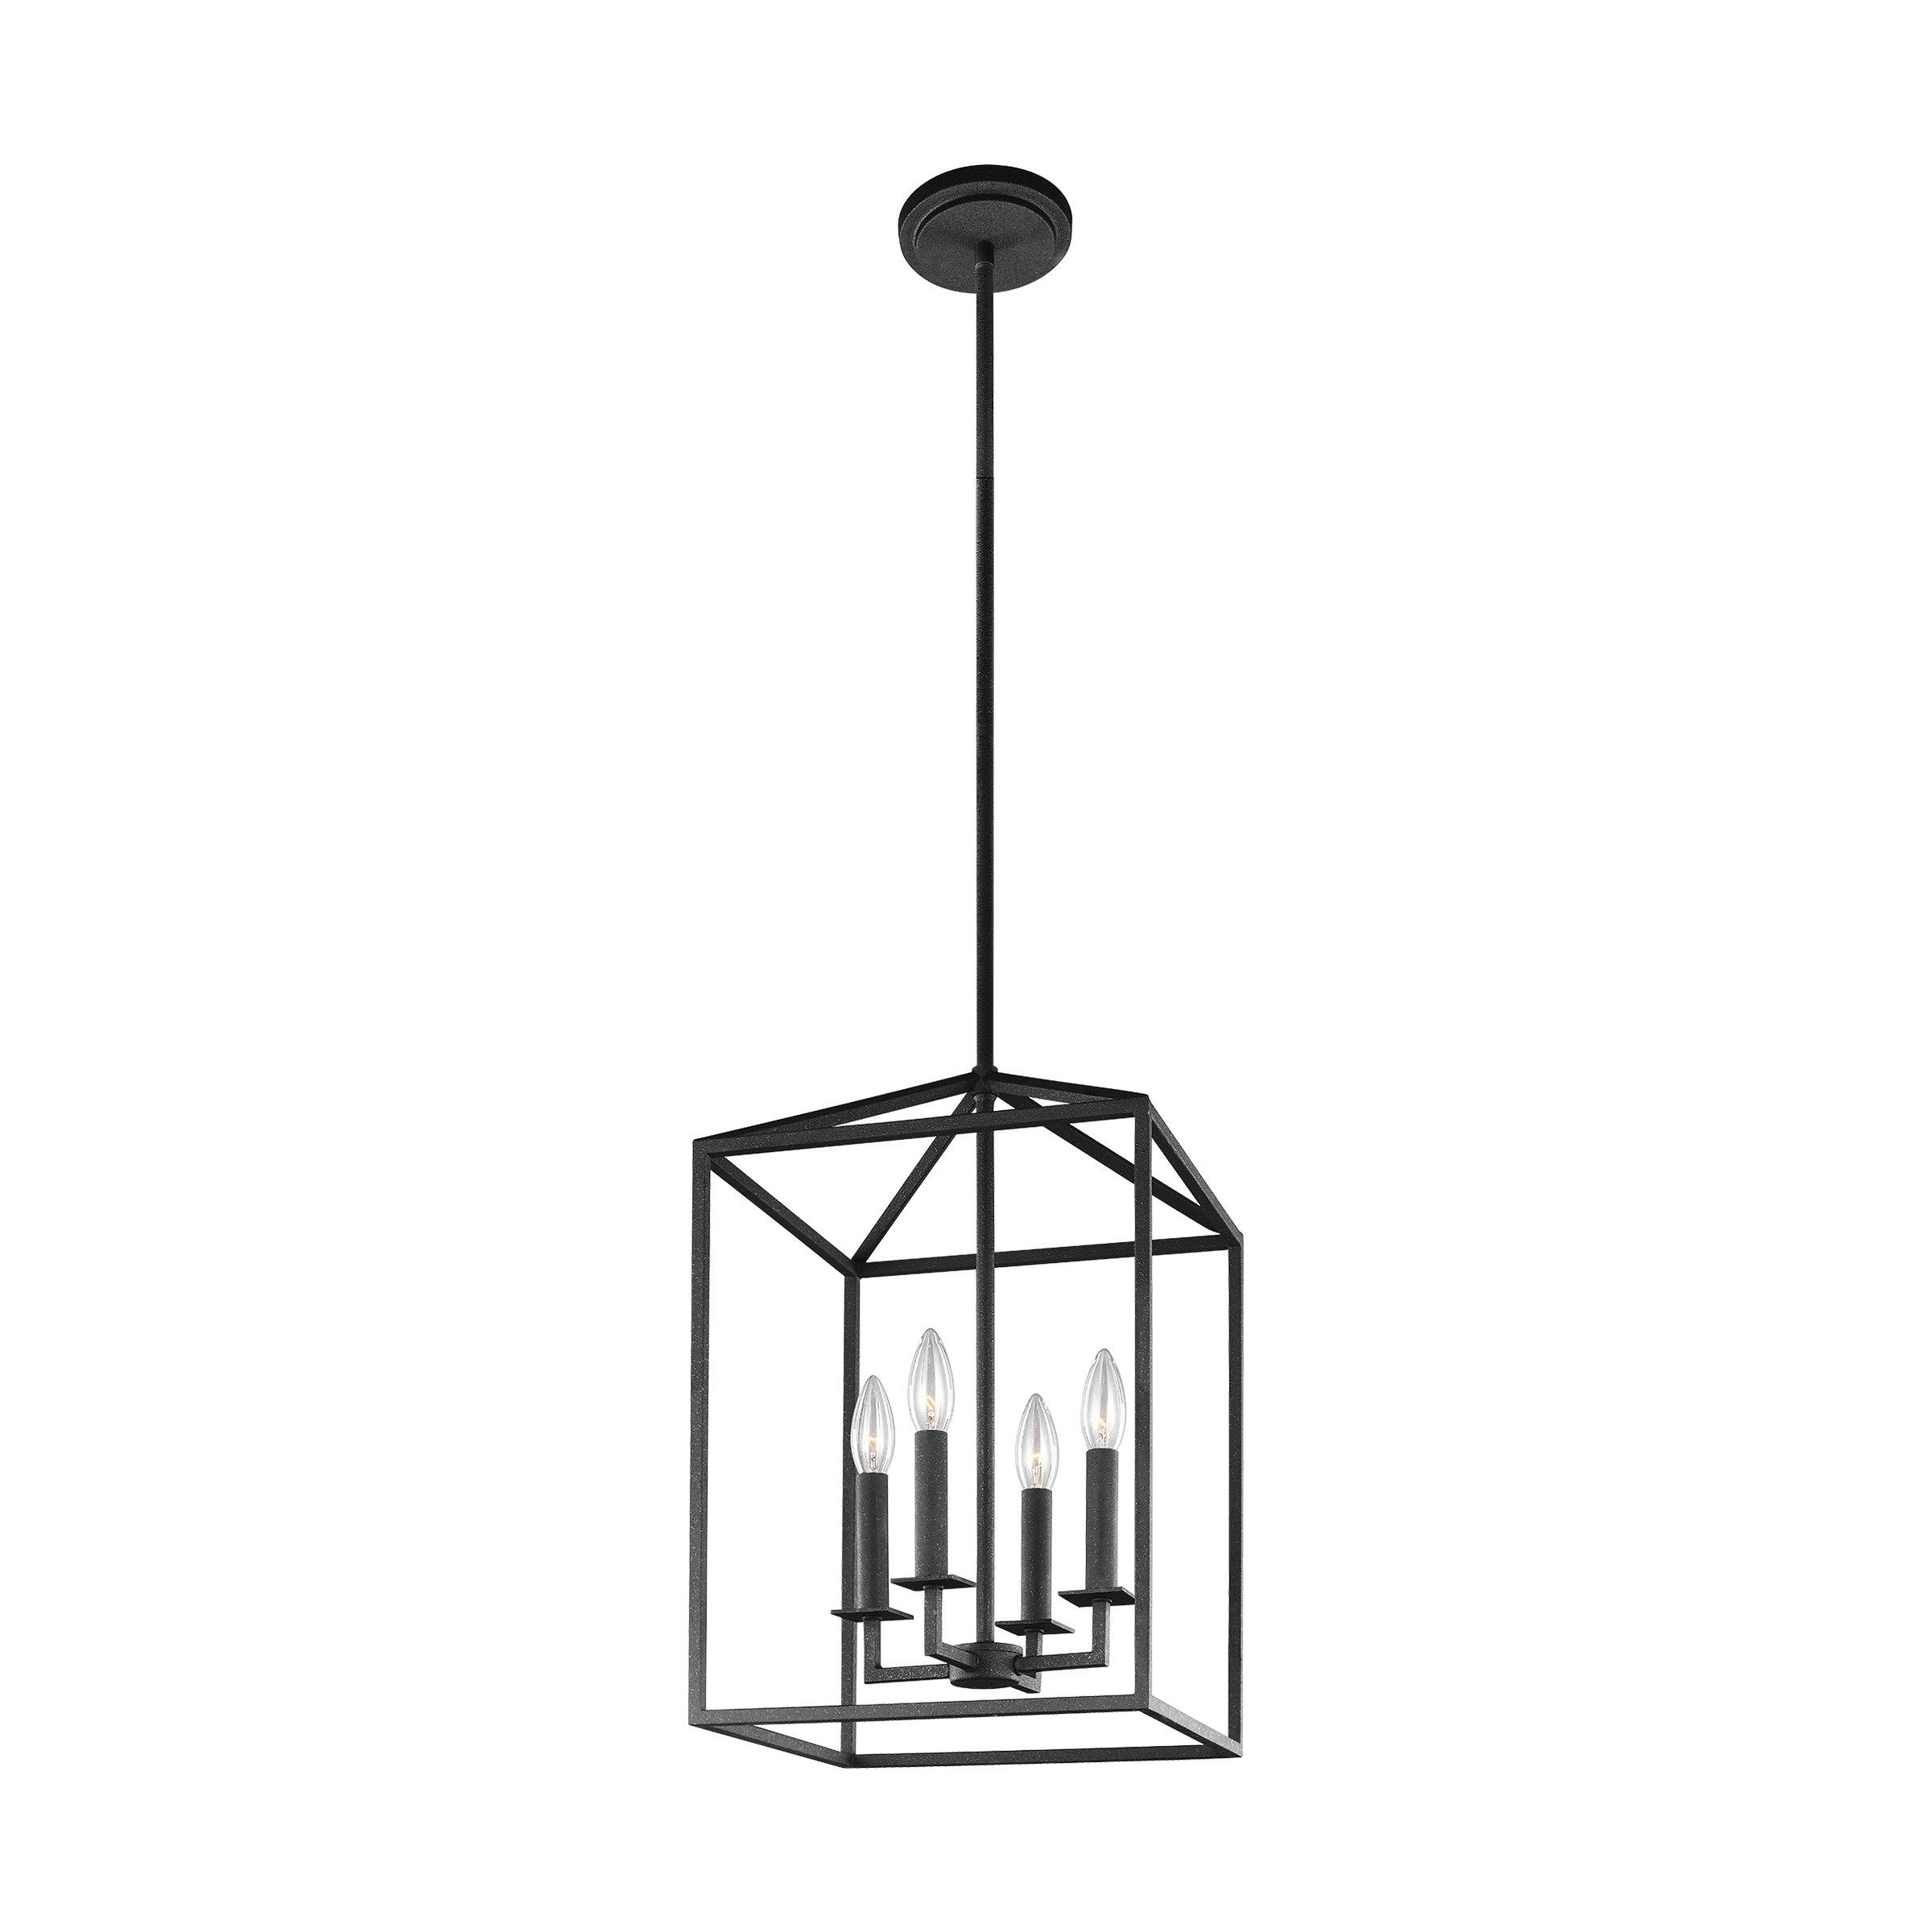 Odie 4 Light Lantern Square / Rectangle Pendant Regarding 2020 Odie 4 Light Lantern Square Pendants (View 8 of 25)